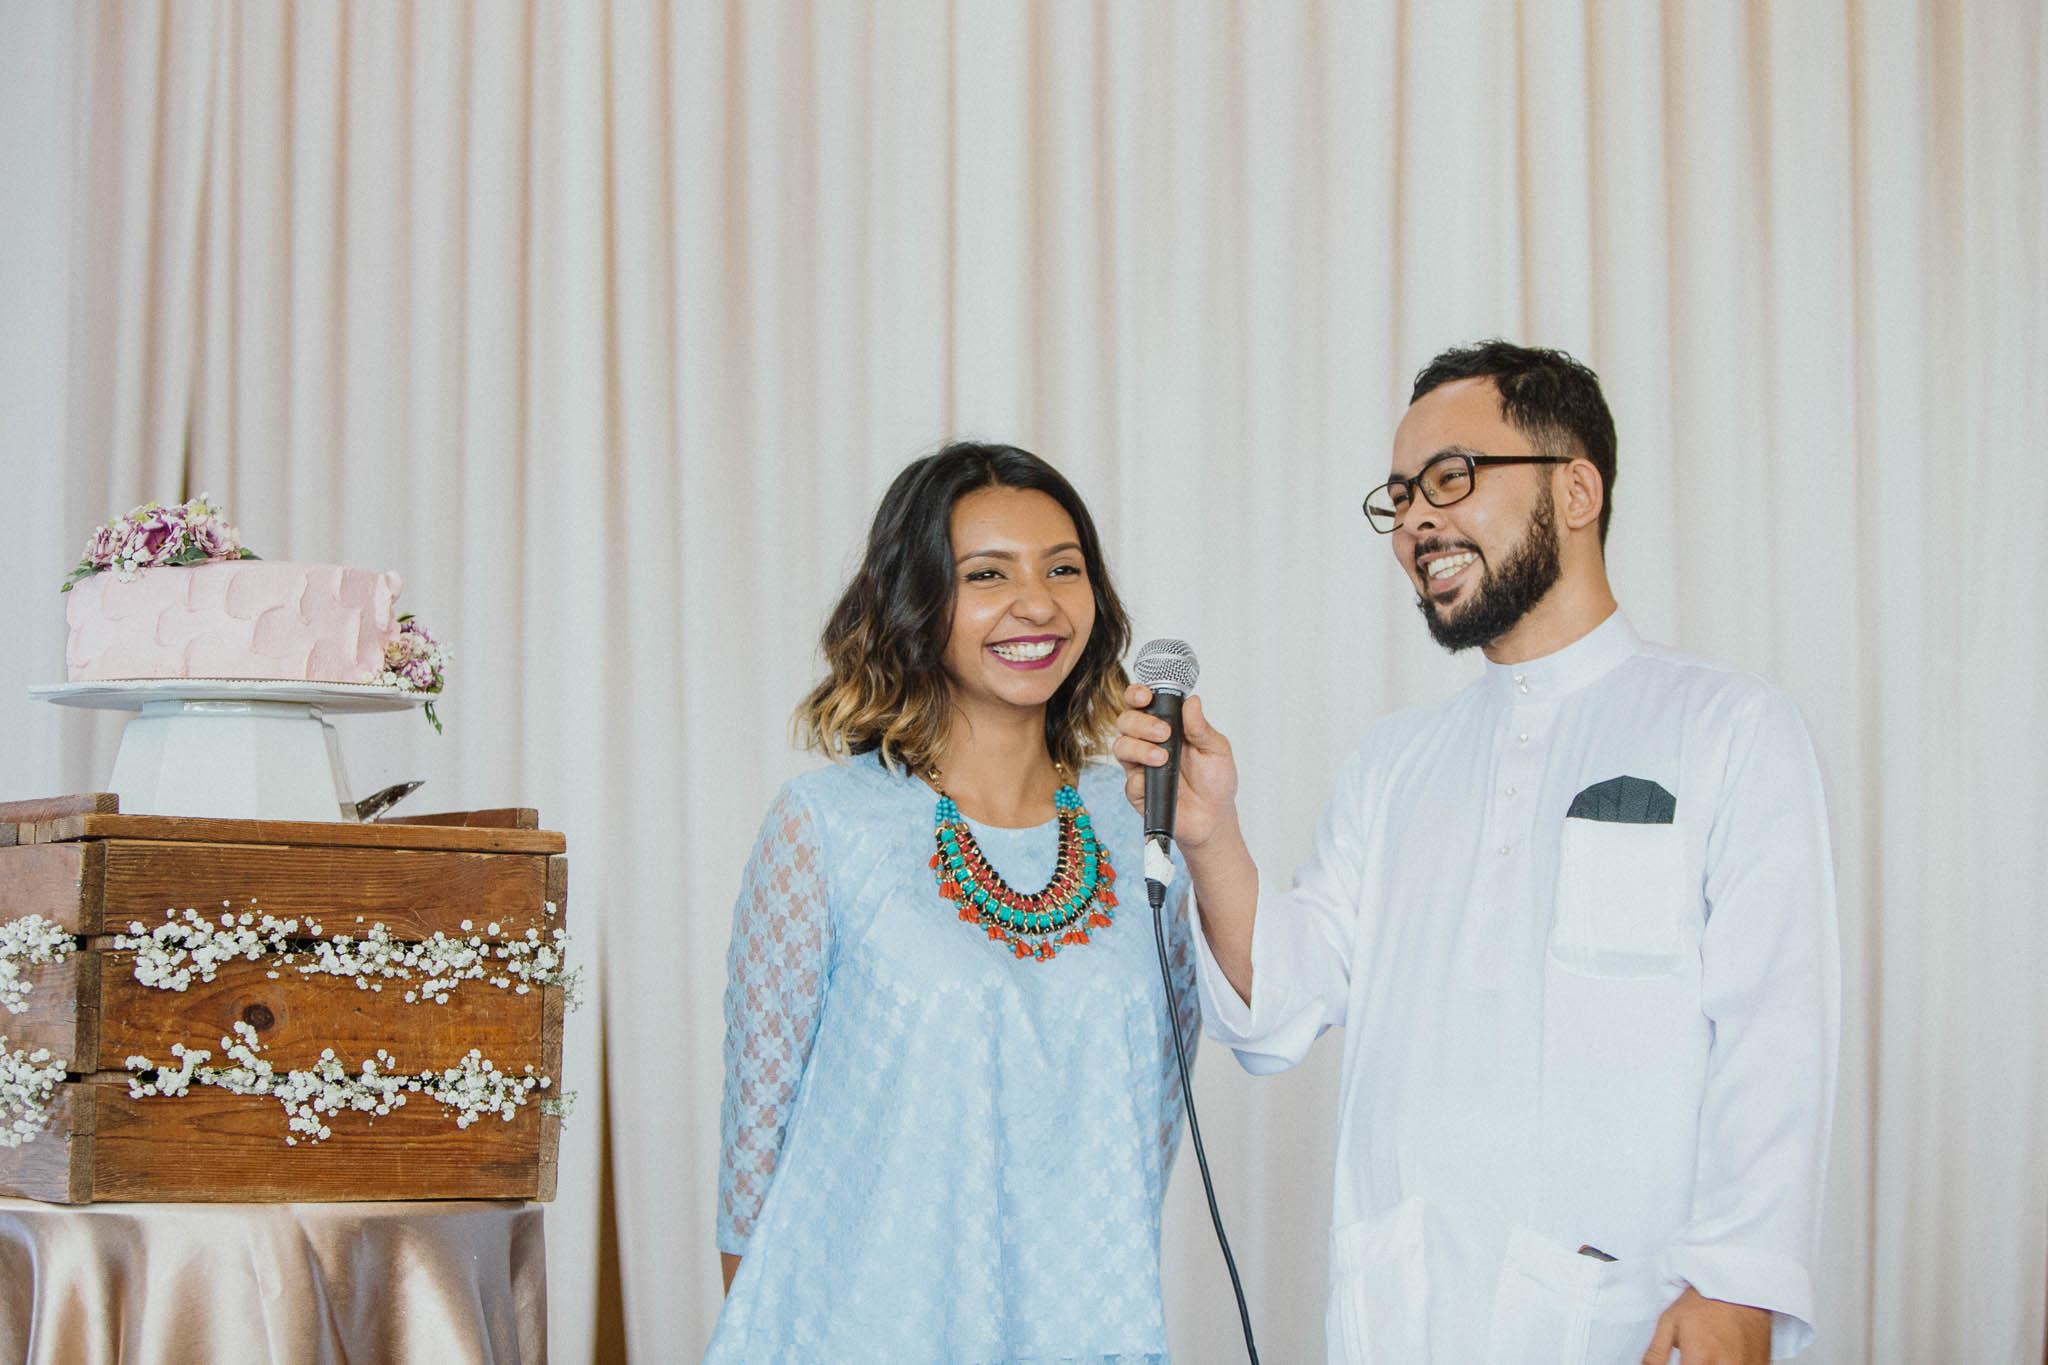 singapore-wedding-photographer-wedding-nufail-addafiq-062.jpg